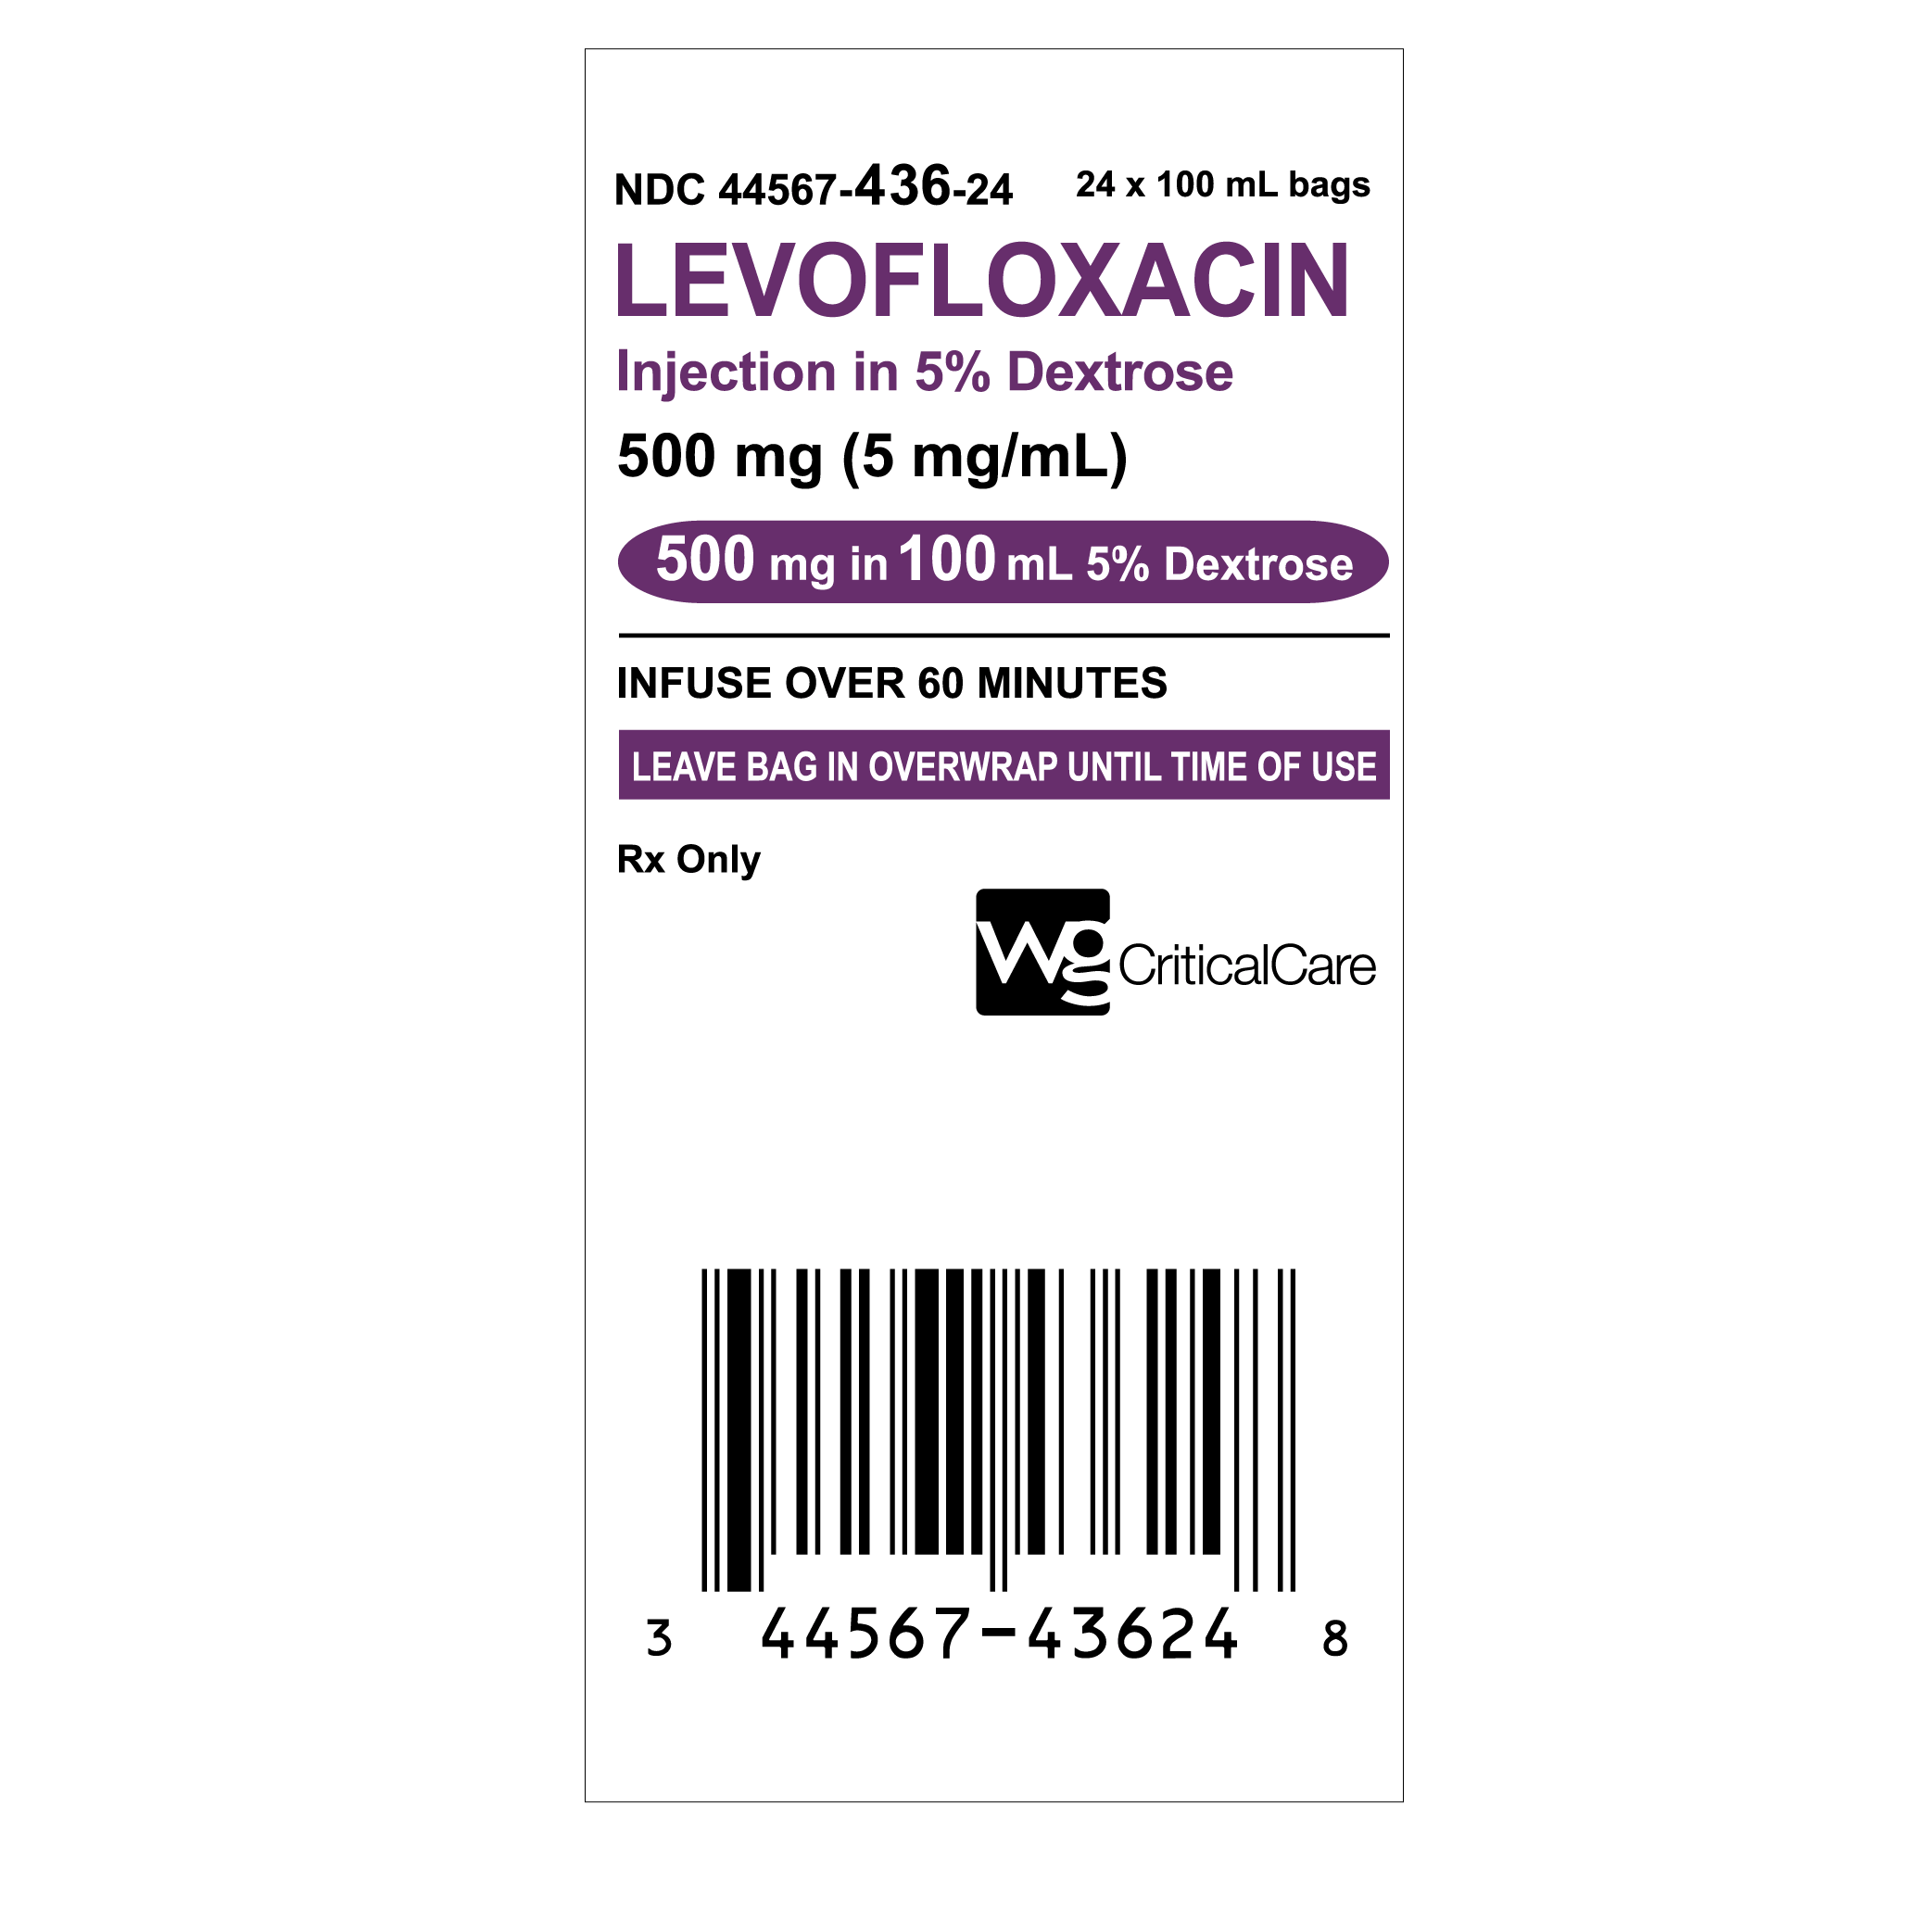 Levofloxacin Injection in 5% Dextrose – WG Critical Care